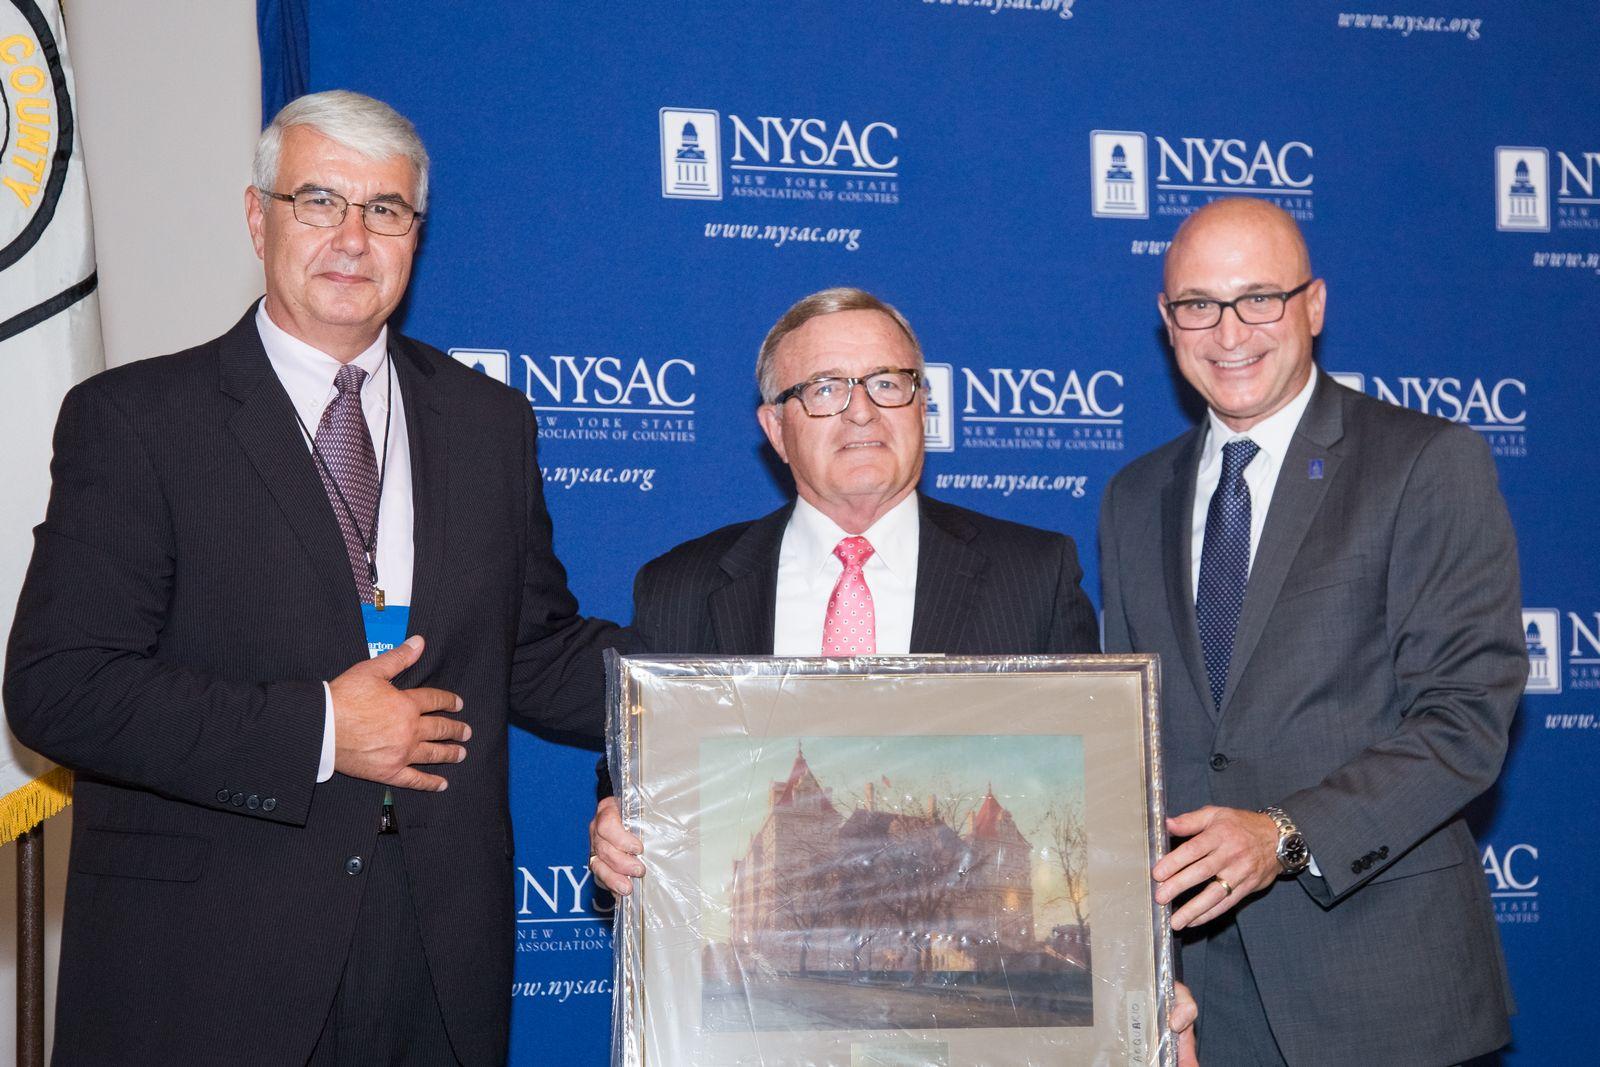 Senator DeFrancisco with NYSAC President Bill Cherry and Exec. Director Stephen Acquario.